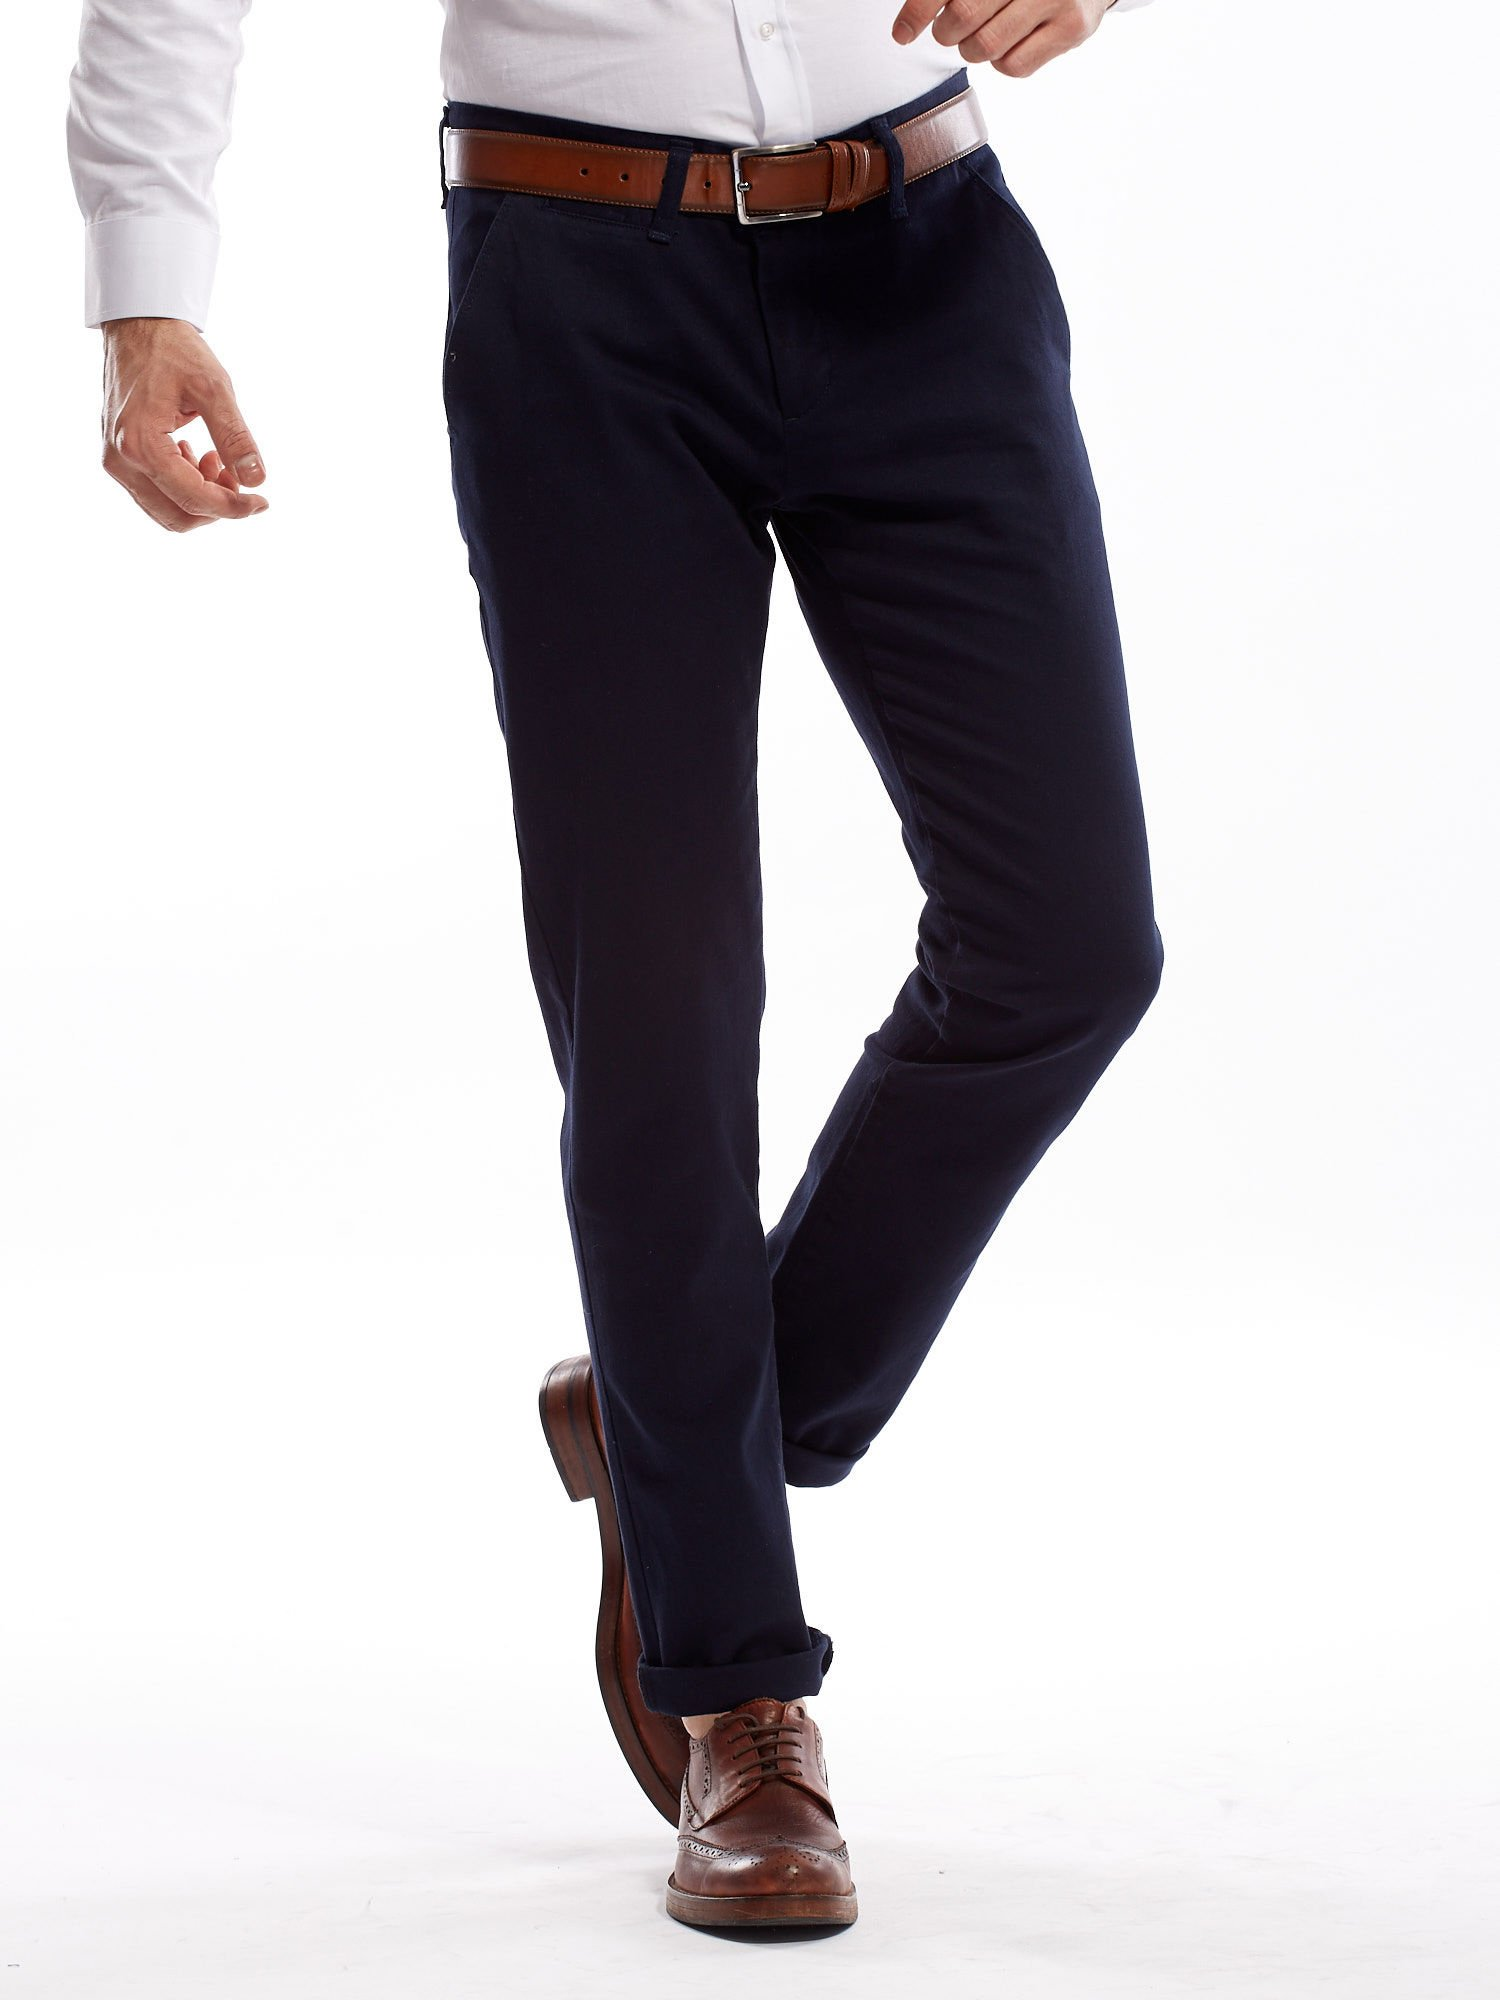 4e7bb5e1 Granatowe spodnie męskie chinosy o prostym kroju - Mężczyźni Spodnie ...